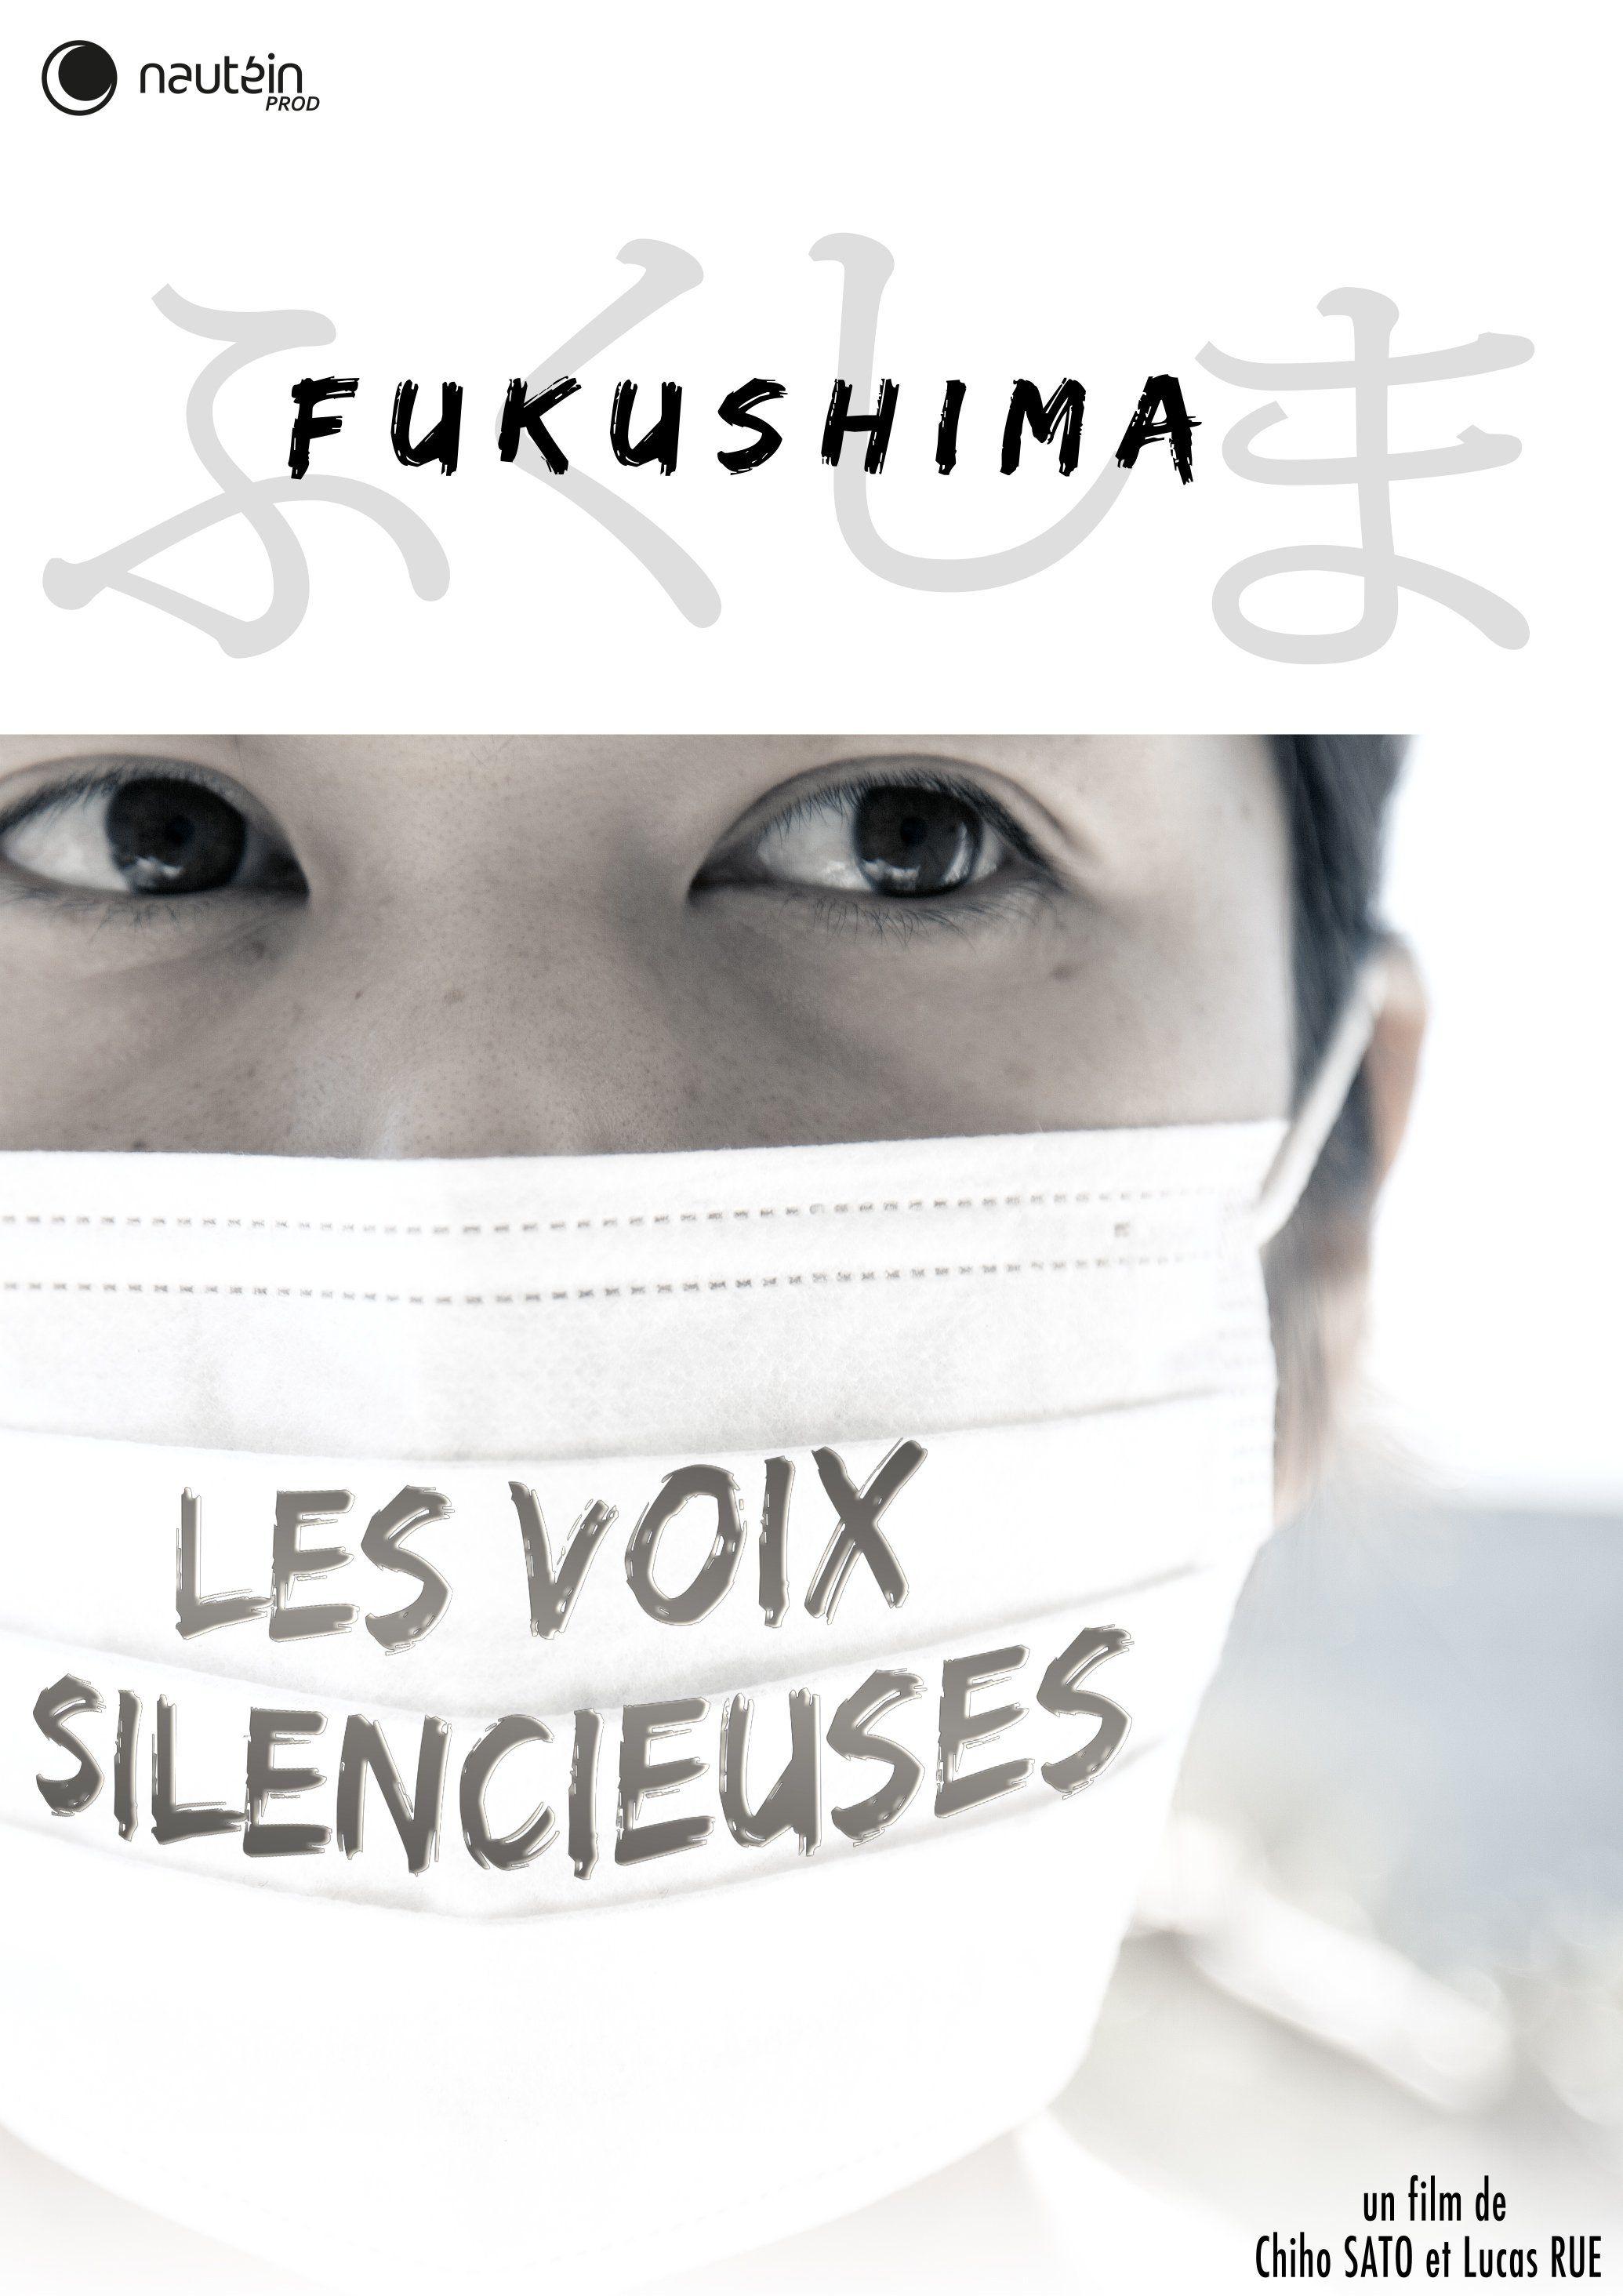 Fukushima: Les voix silencieuses - Documentaire (2016)